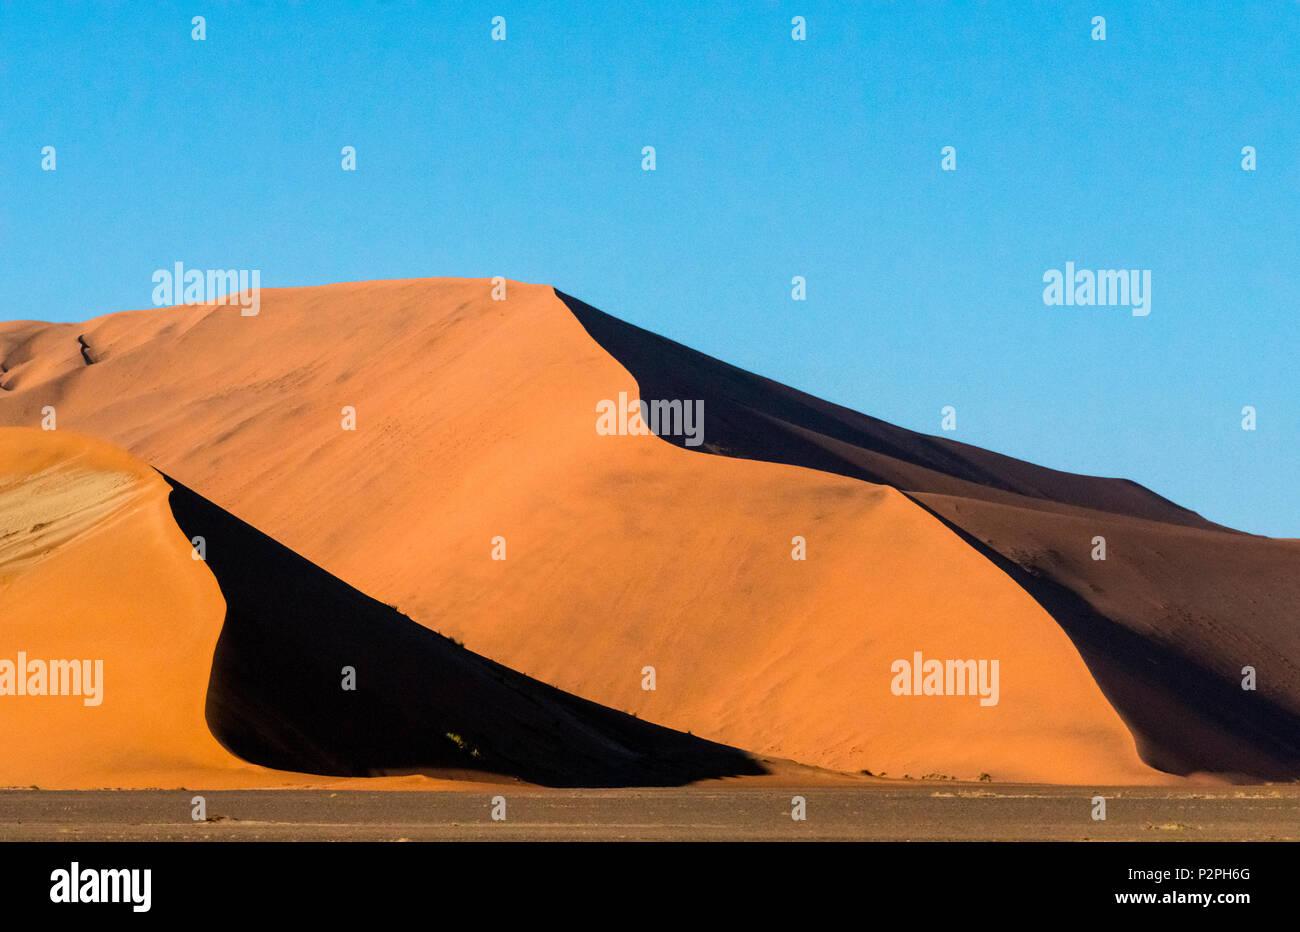 Sand dune 45 in southern Namib Desert, Sossusvlei, Namib-Naukluft National Park, Hardap Region, Namibia Stock Photo